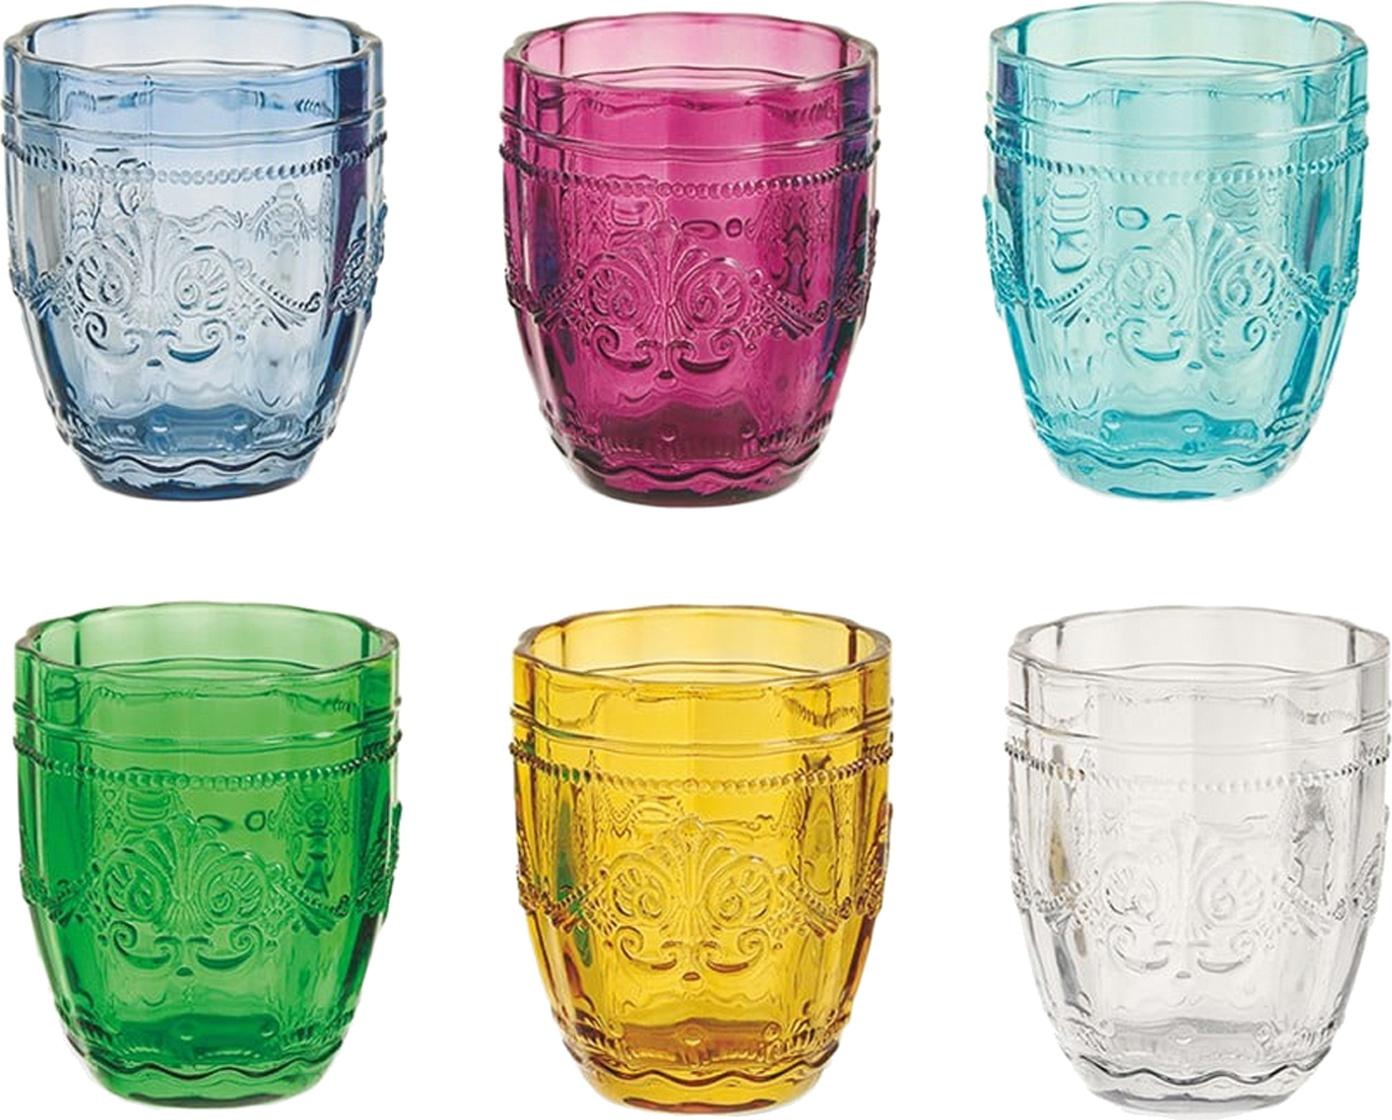 Wassergläser Syrah mit Strukturmuster in Bunt, 6er-Set, Glas, Mehrfarbig, Ø 8 x H 10 cm